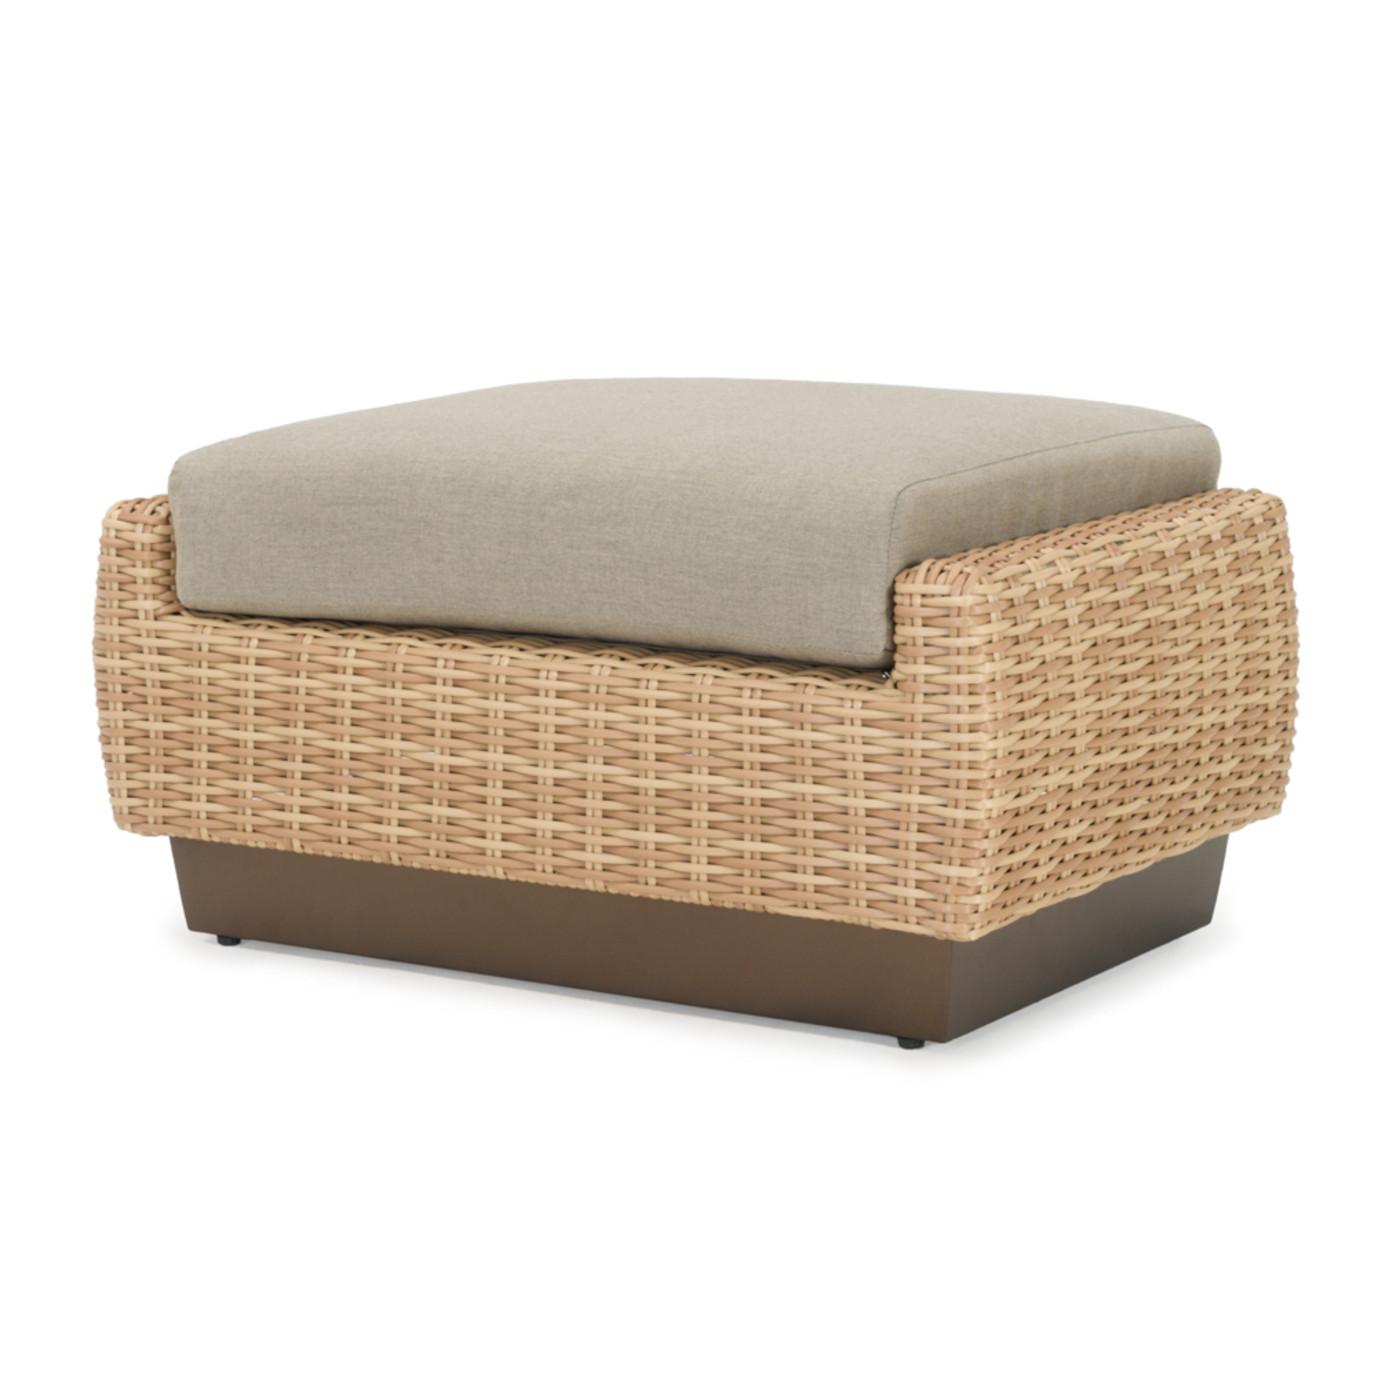 Portofino® Prestige 8pc Motion Deep Seating Set - Sand